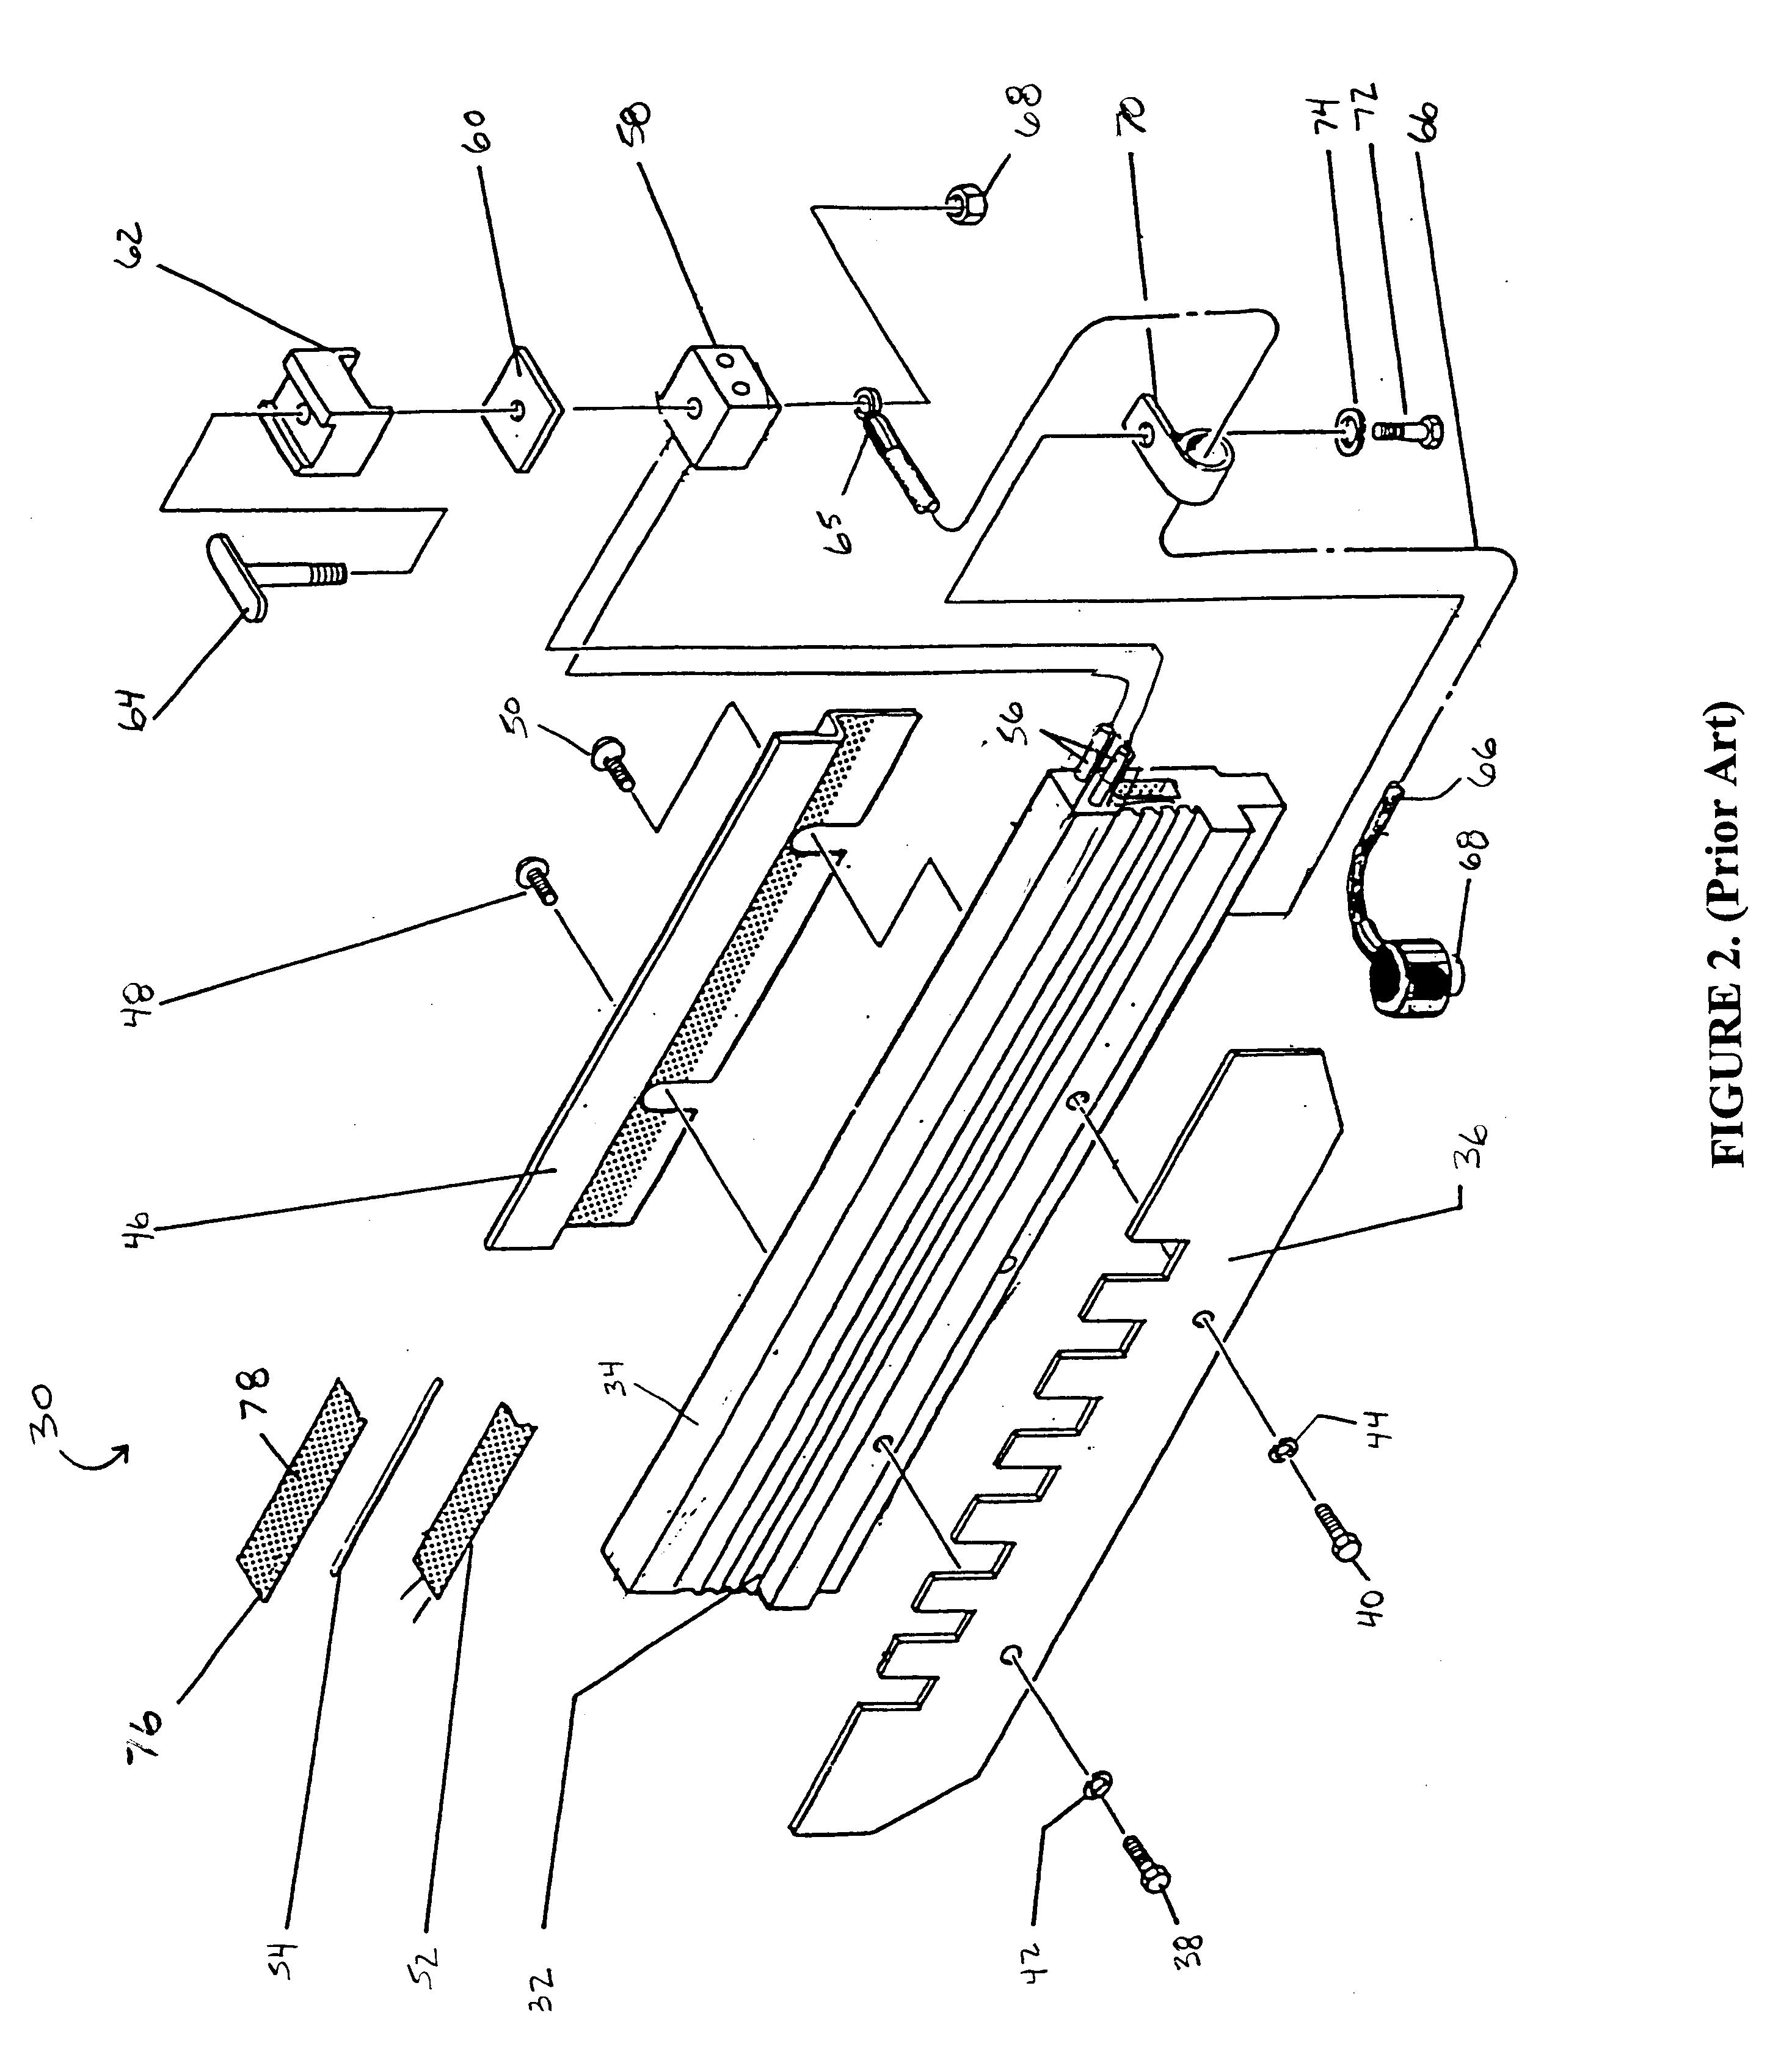 US06789371 20040914 D00002 patent us6789371 tapeless seal bar assembly google patents  at bayanpartner.co